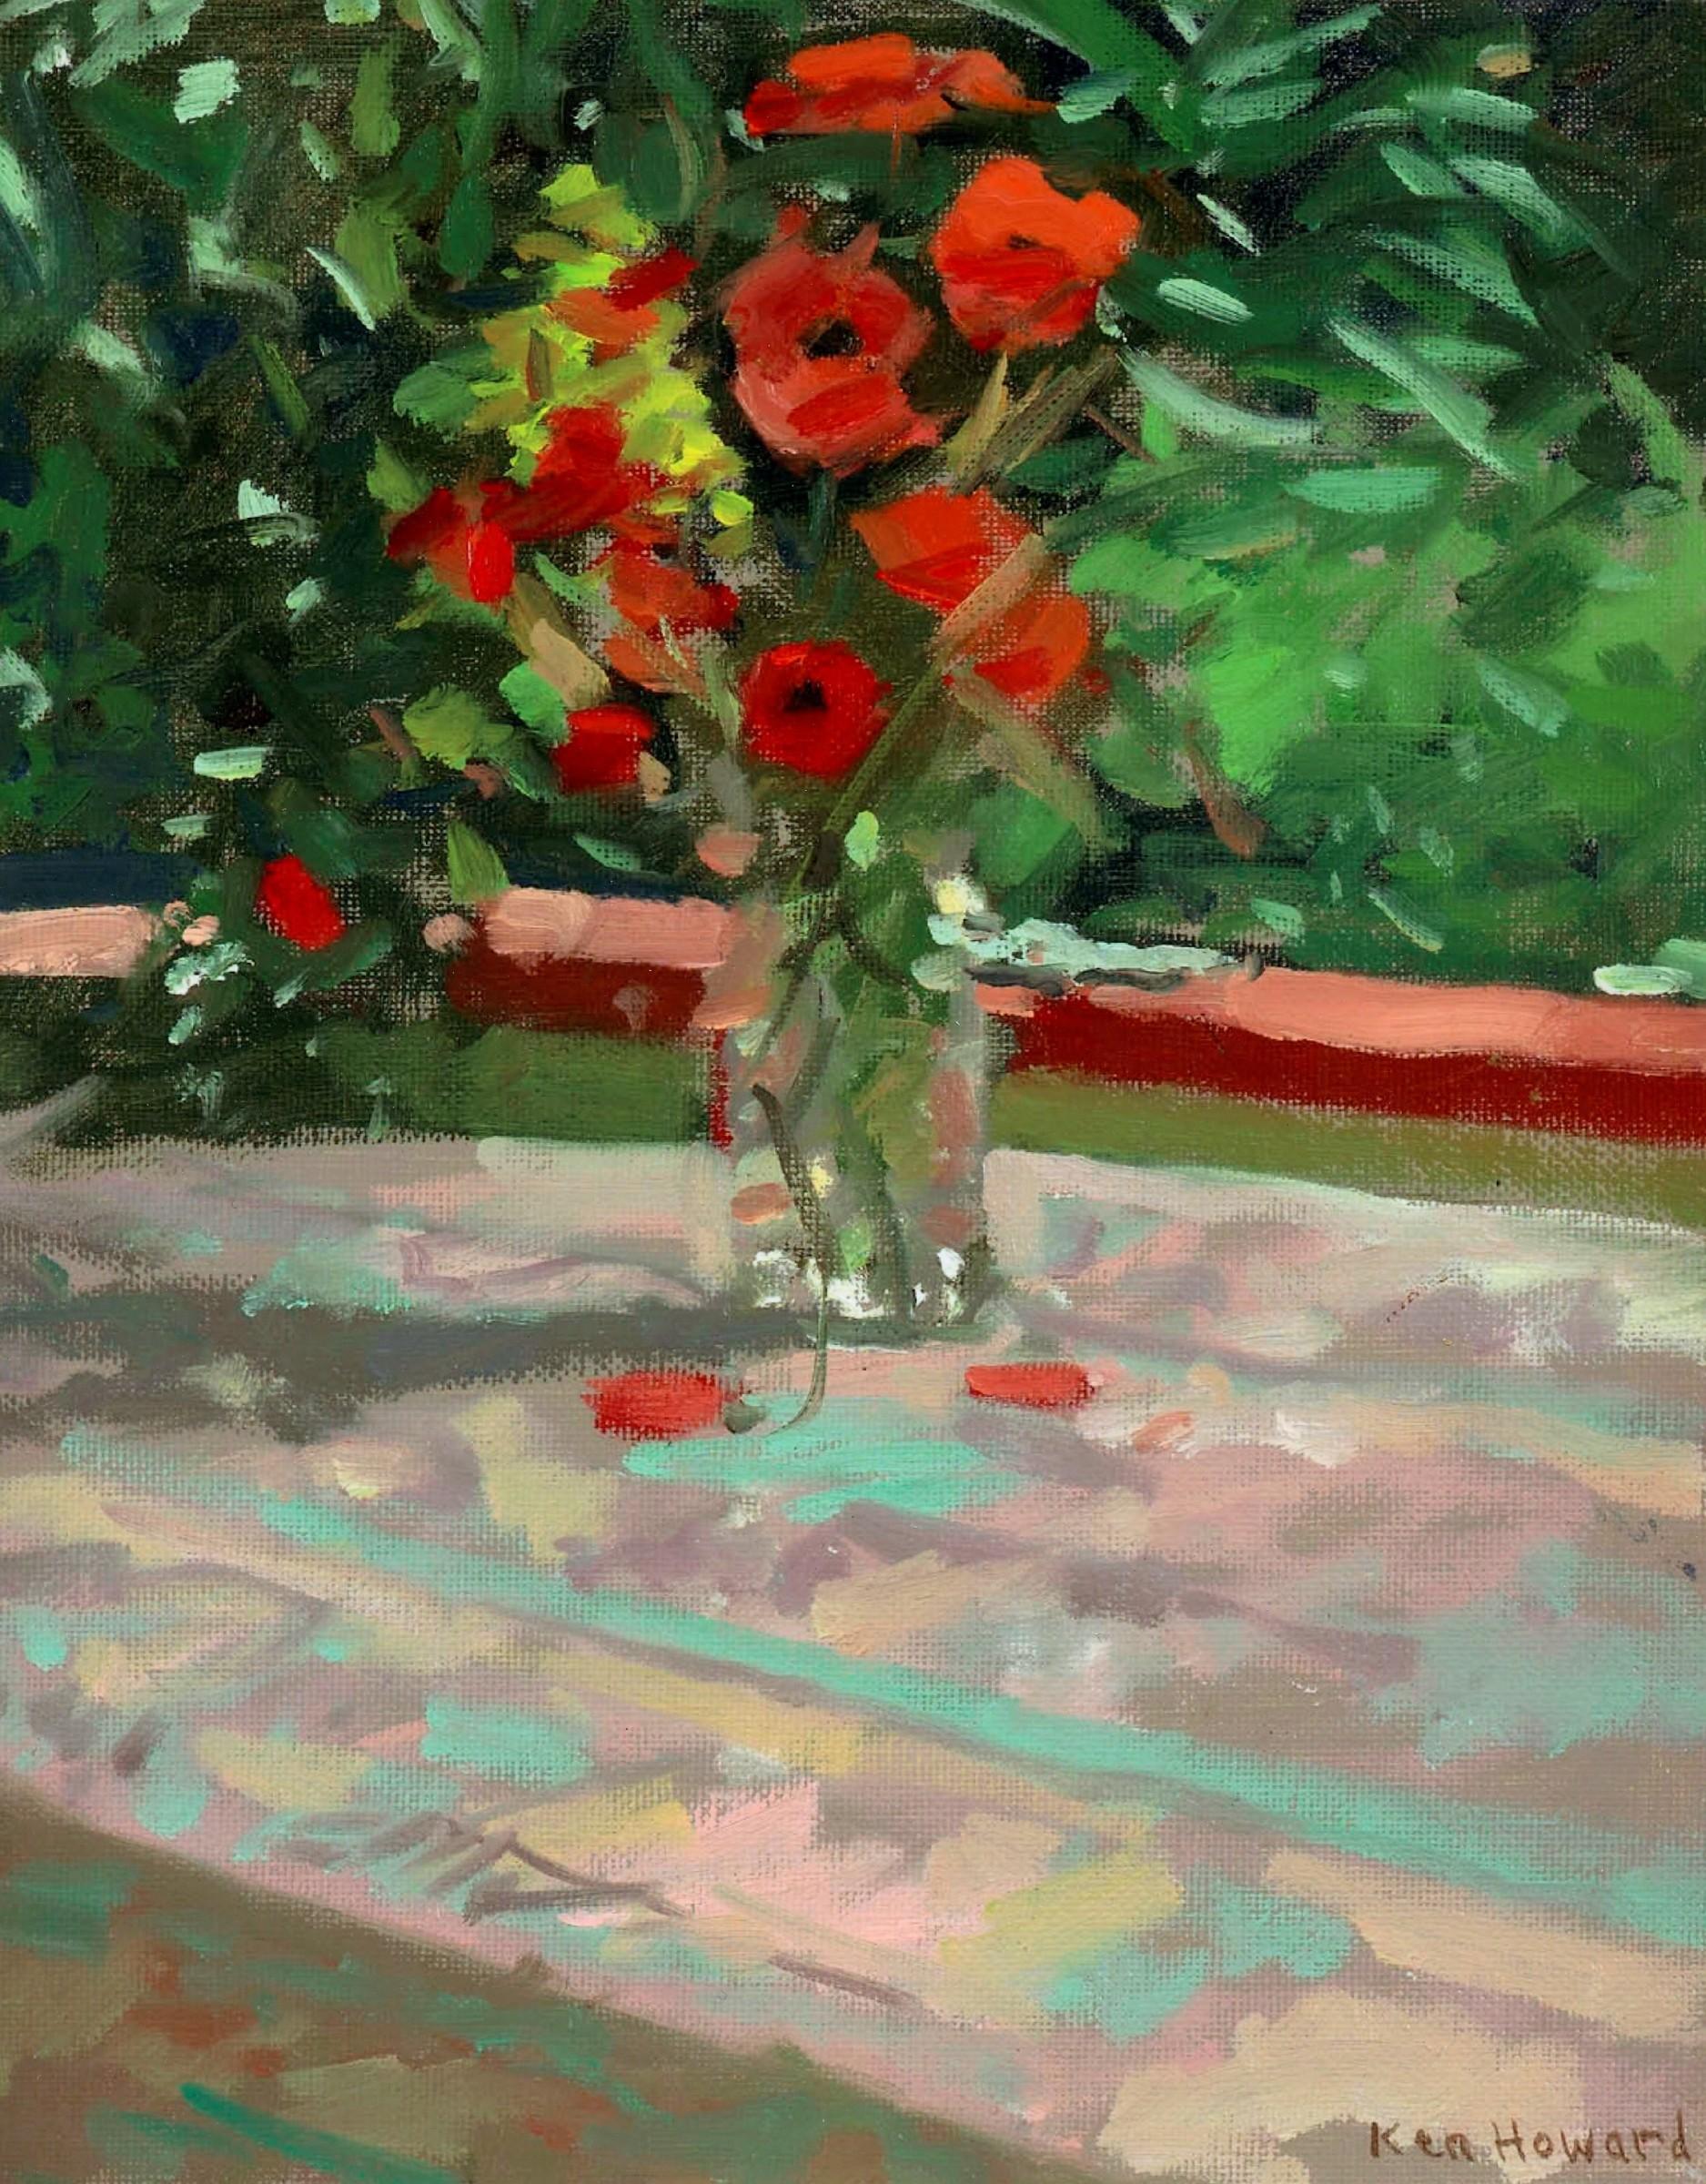 "<span class=""link fancybox-details-link""><a href=""/artists/71-ken-howard-ra/works/11527-ken-howard-ra-wild-flowers/"">View Detail Page</a></span><div class=""artist""><span class=""artist""><strong>Ken Howard RA</strong></span></div><div class=""title""><em>Wild Flowers</em></div><div class=""medium"">watercolour & acrylic</div>"